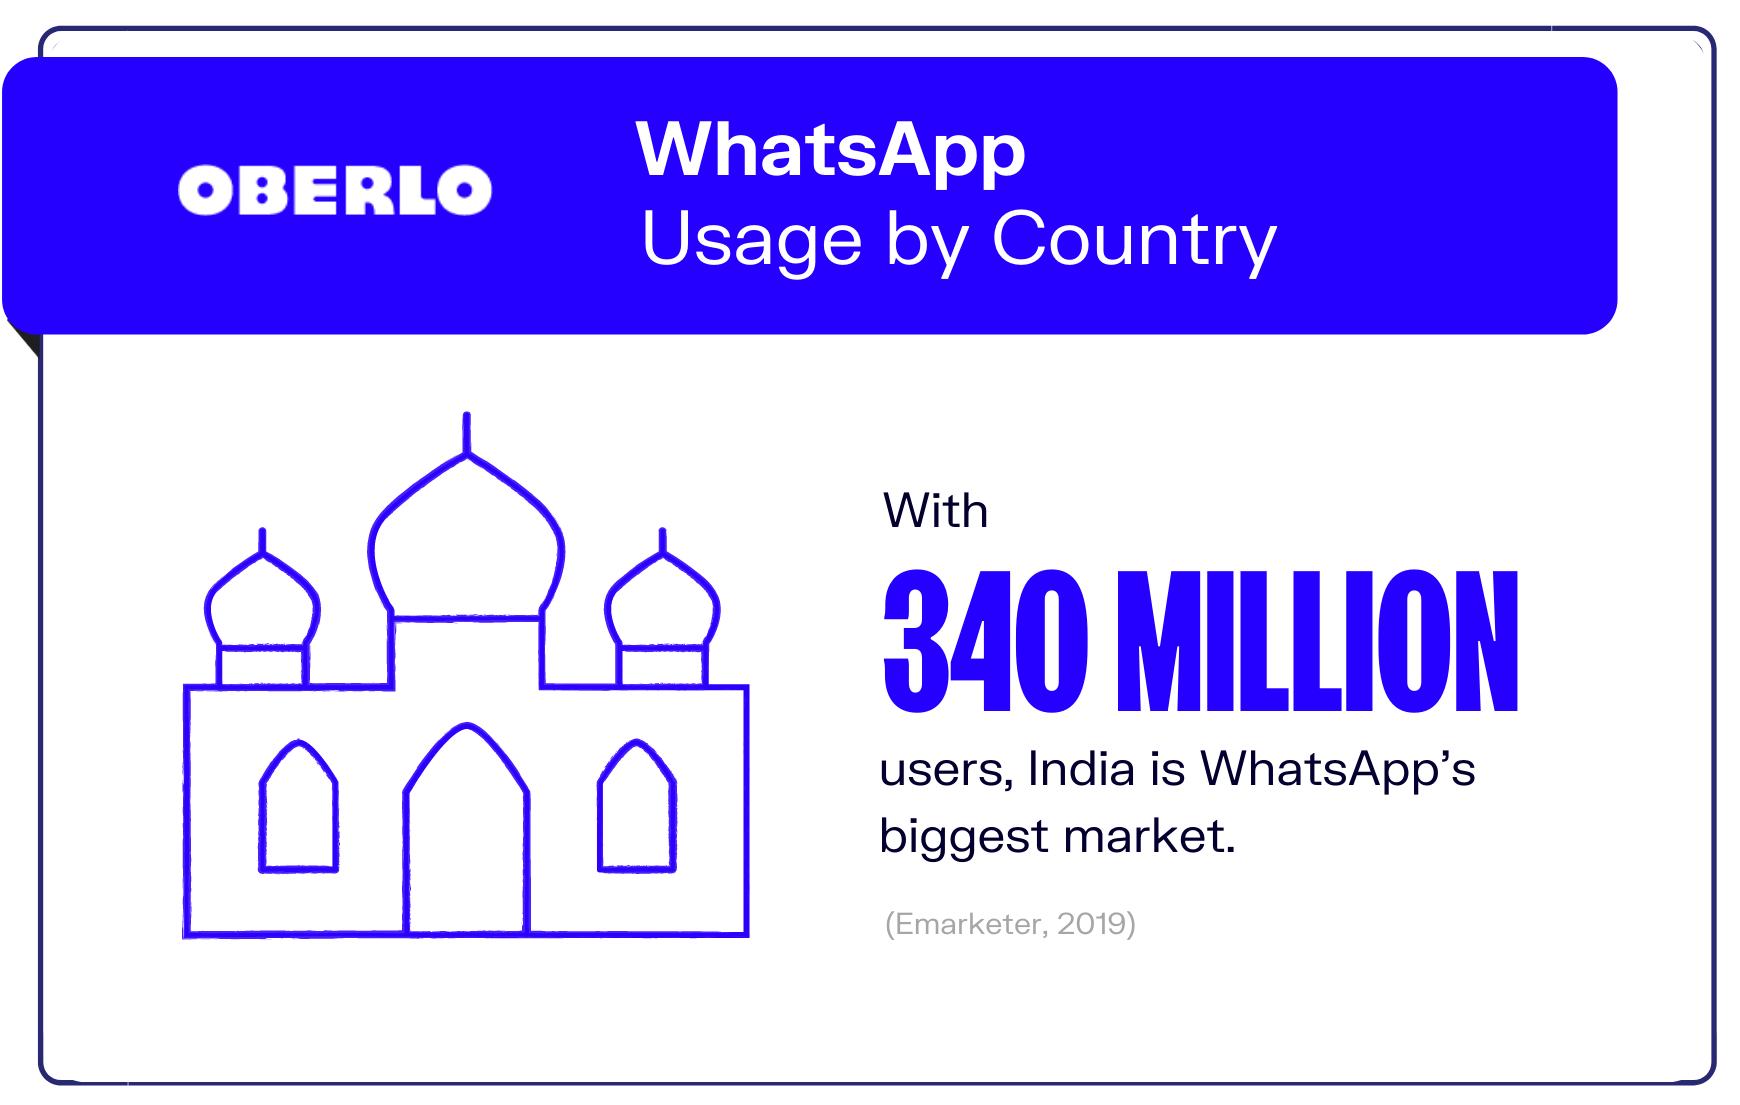 graphic of whatsapp statistic #5